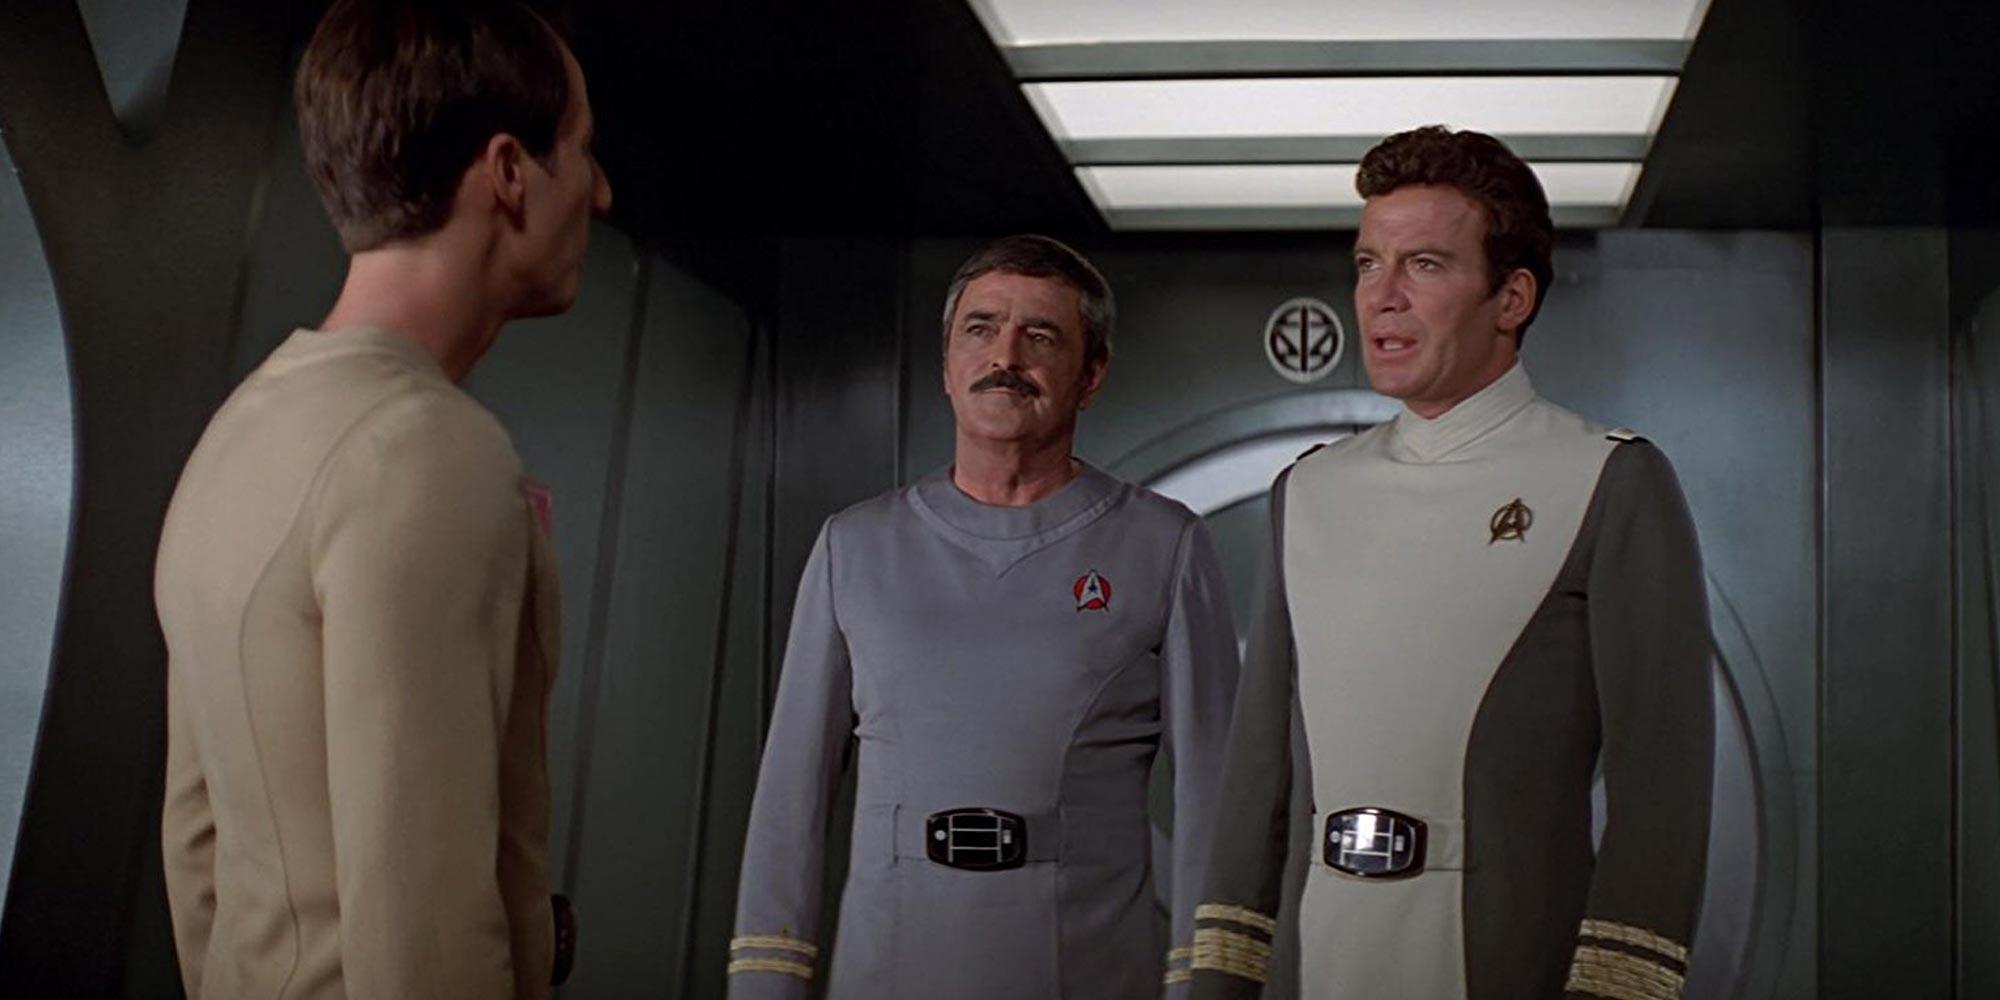 Blu-ray & Digital Media from $5: Star Trek Collection, 10 Cloverfield Lane, Futurama, more